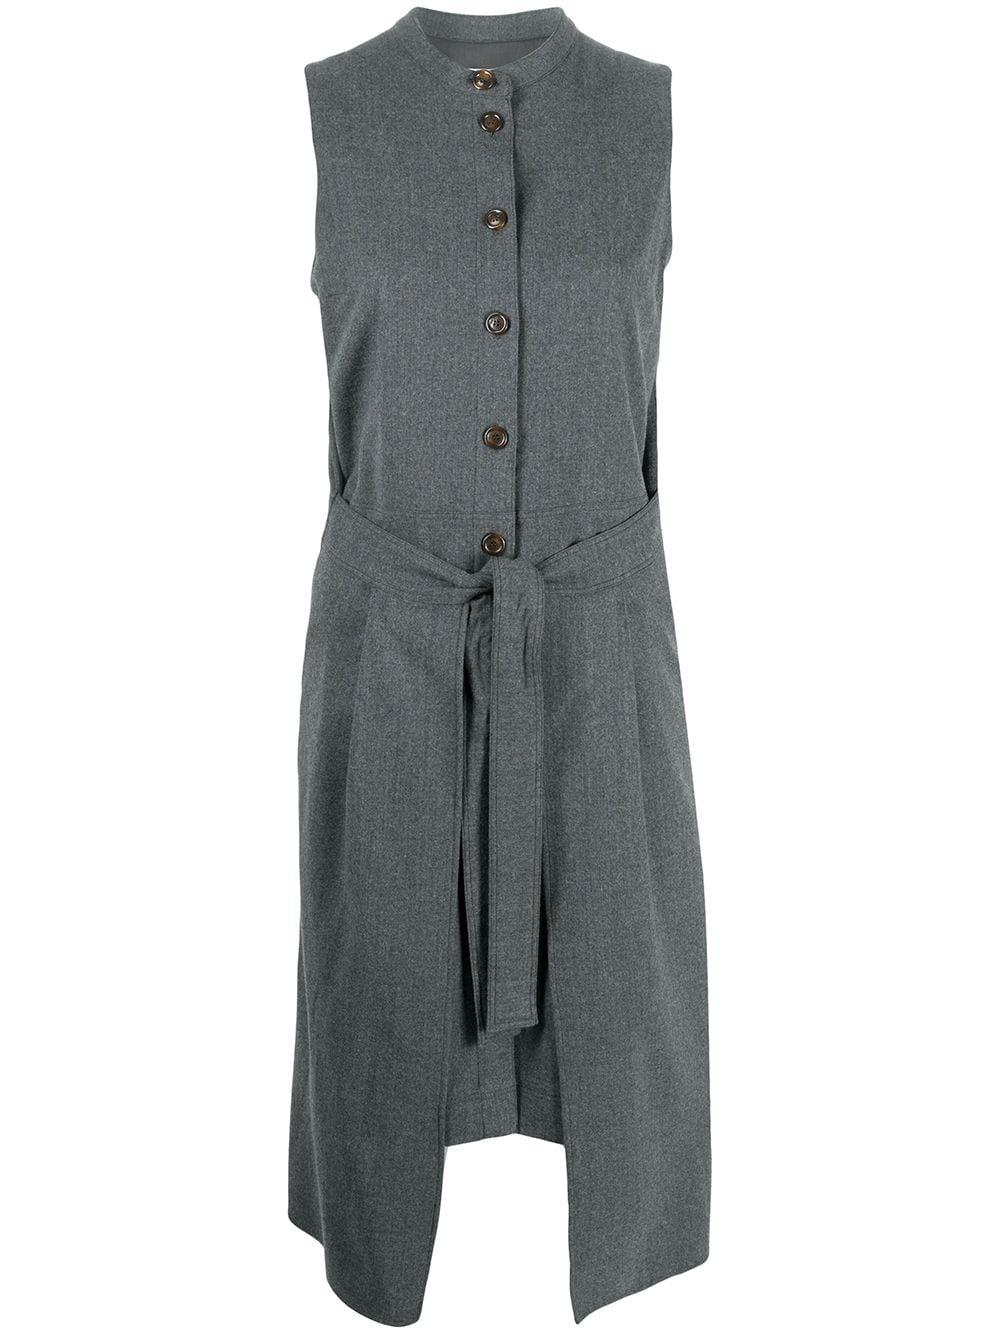 Tie Waist Button Front Dress